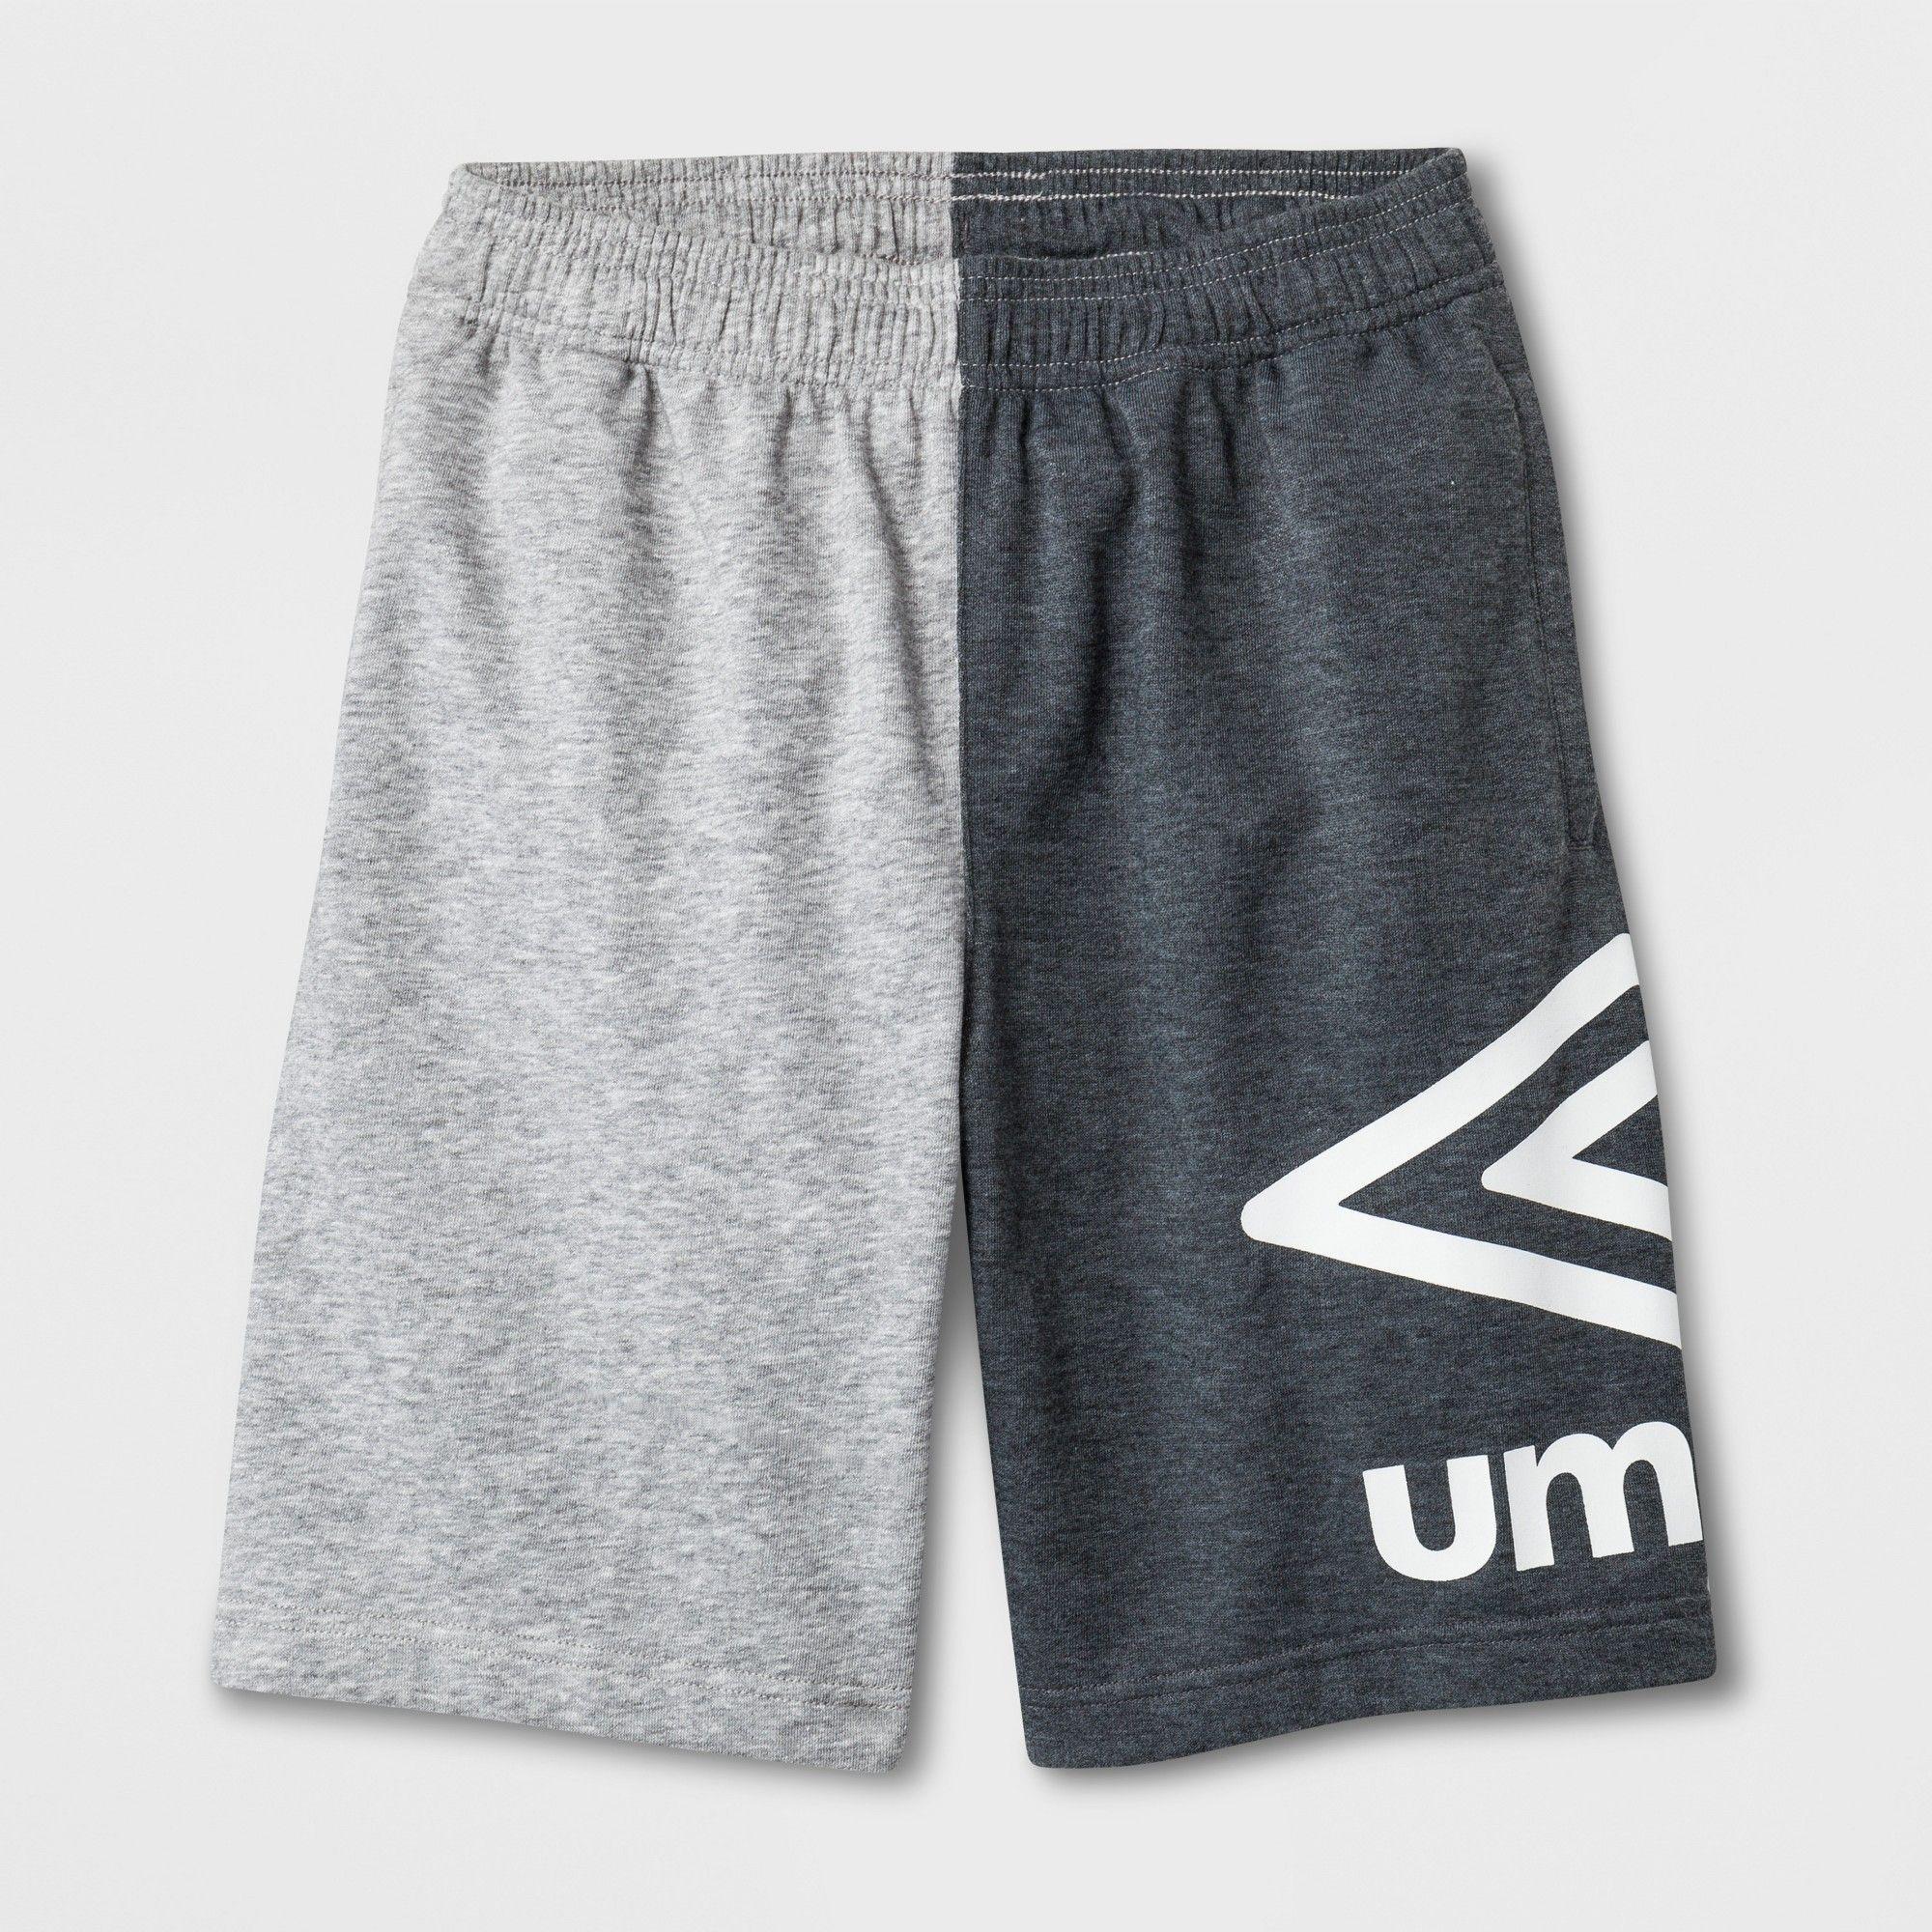 49f8a0443 Umbro Boys' Big Logo Shorts - Gray XL | Products | Athletic shorts ...